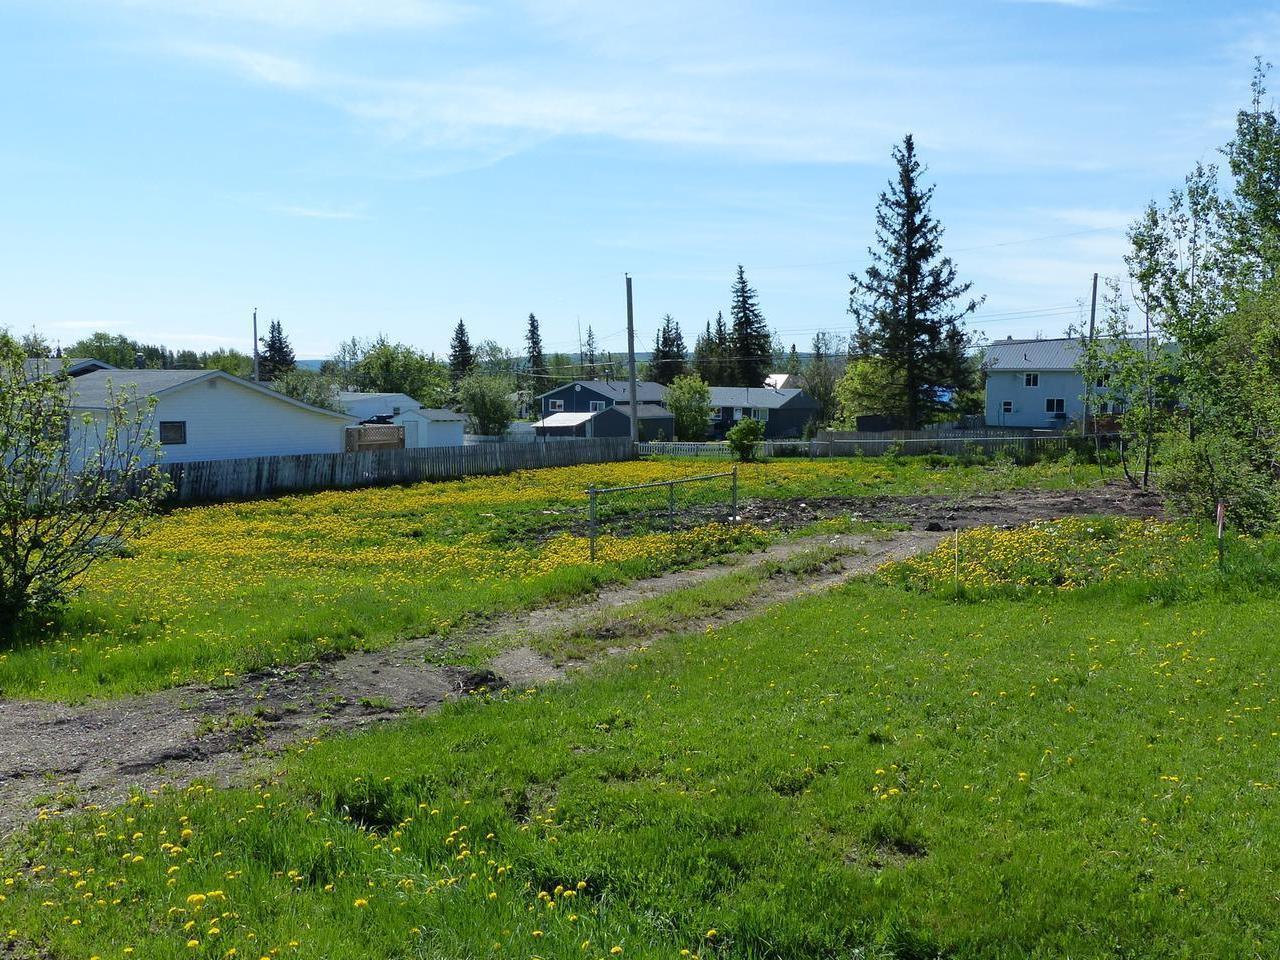 4811 49 Avenue,, Pouce Coupe, British Columbia  V0C 2C0 - Photo 1 - 169571